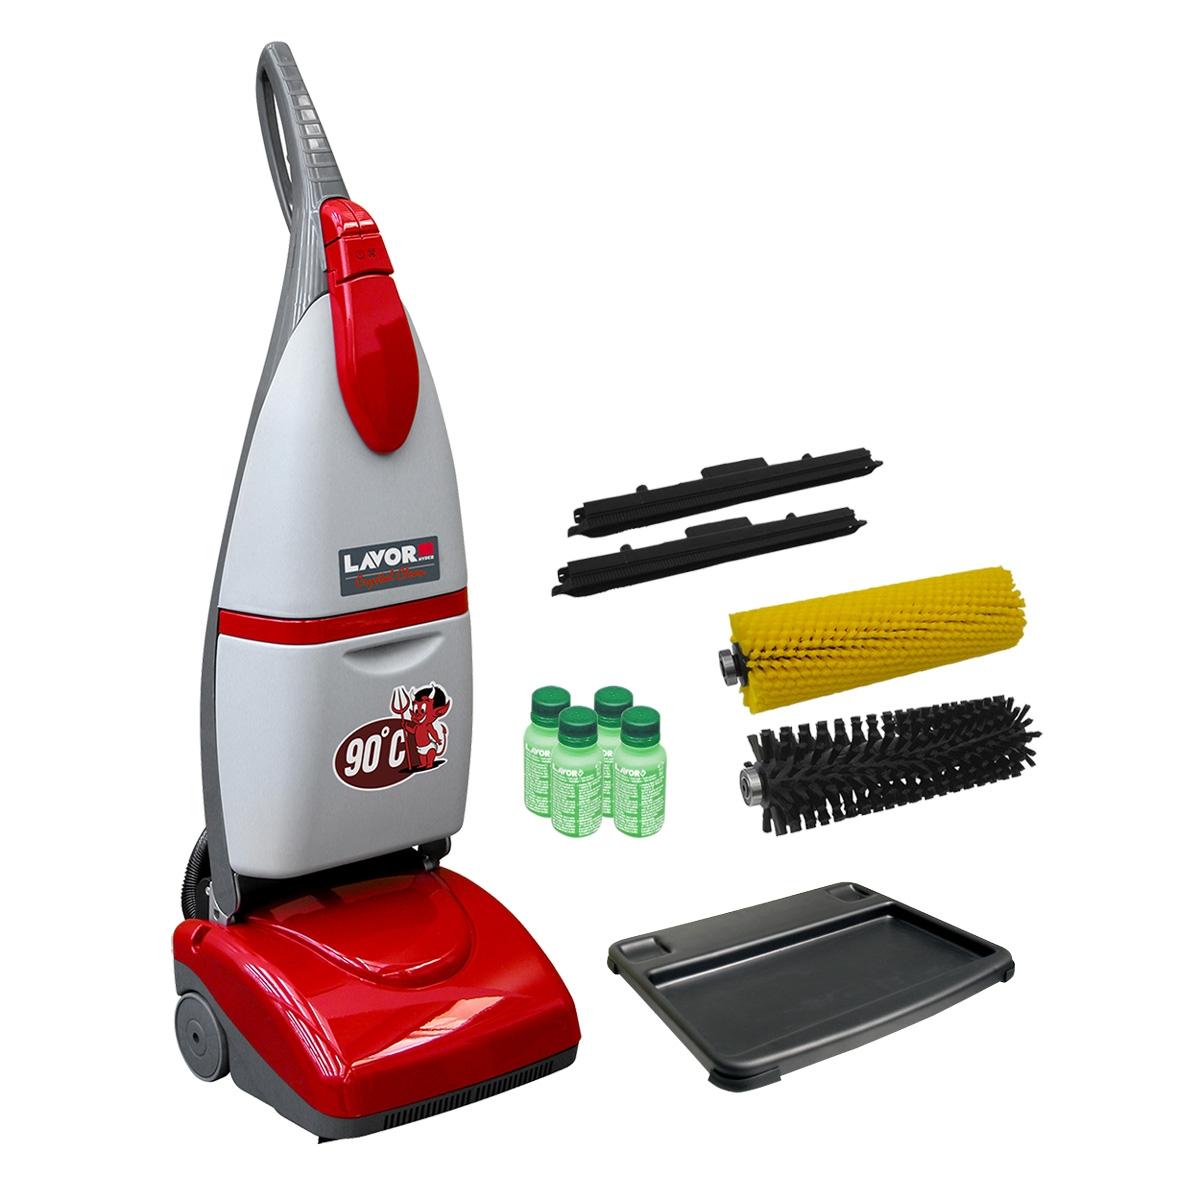 Lavor Pro Crystal Clean Floor Scrubber Cleaner